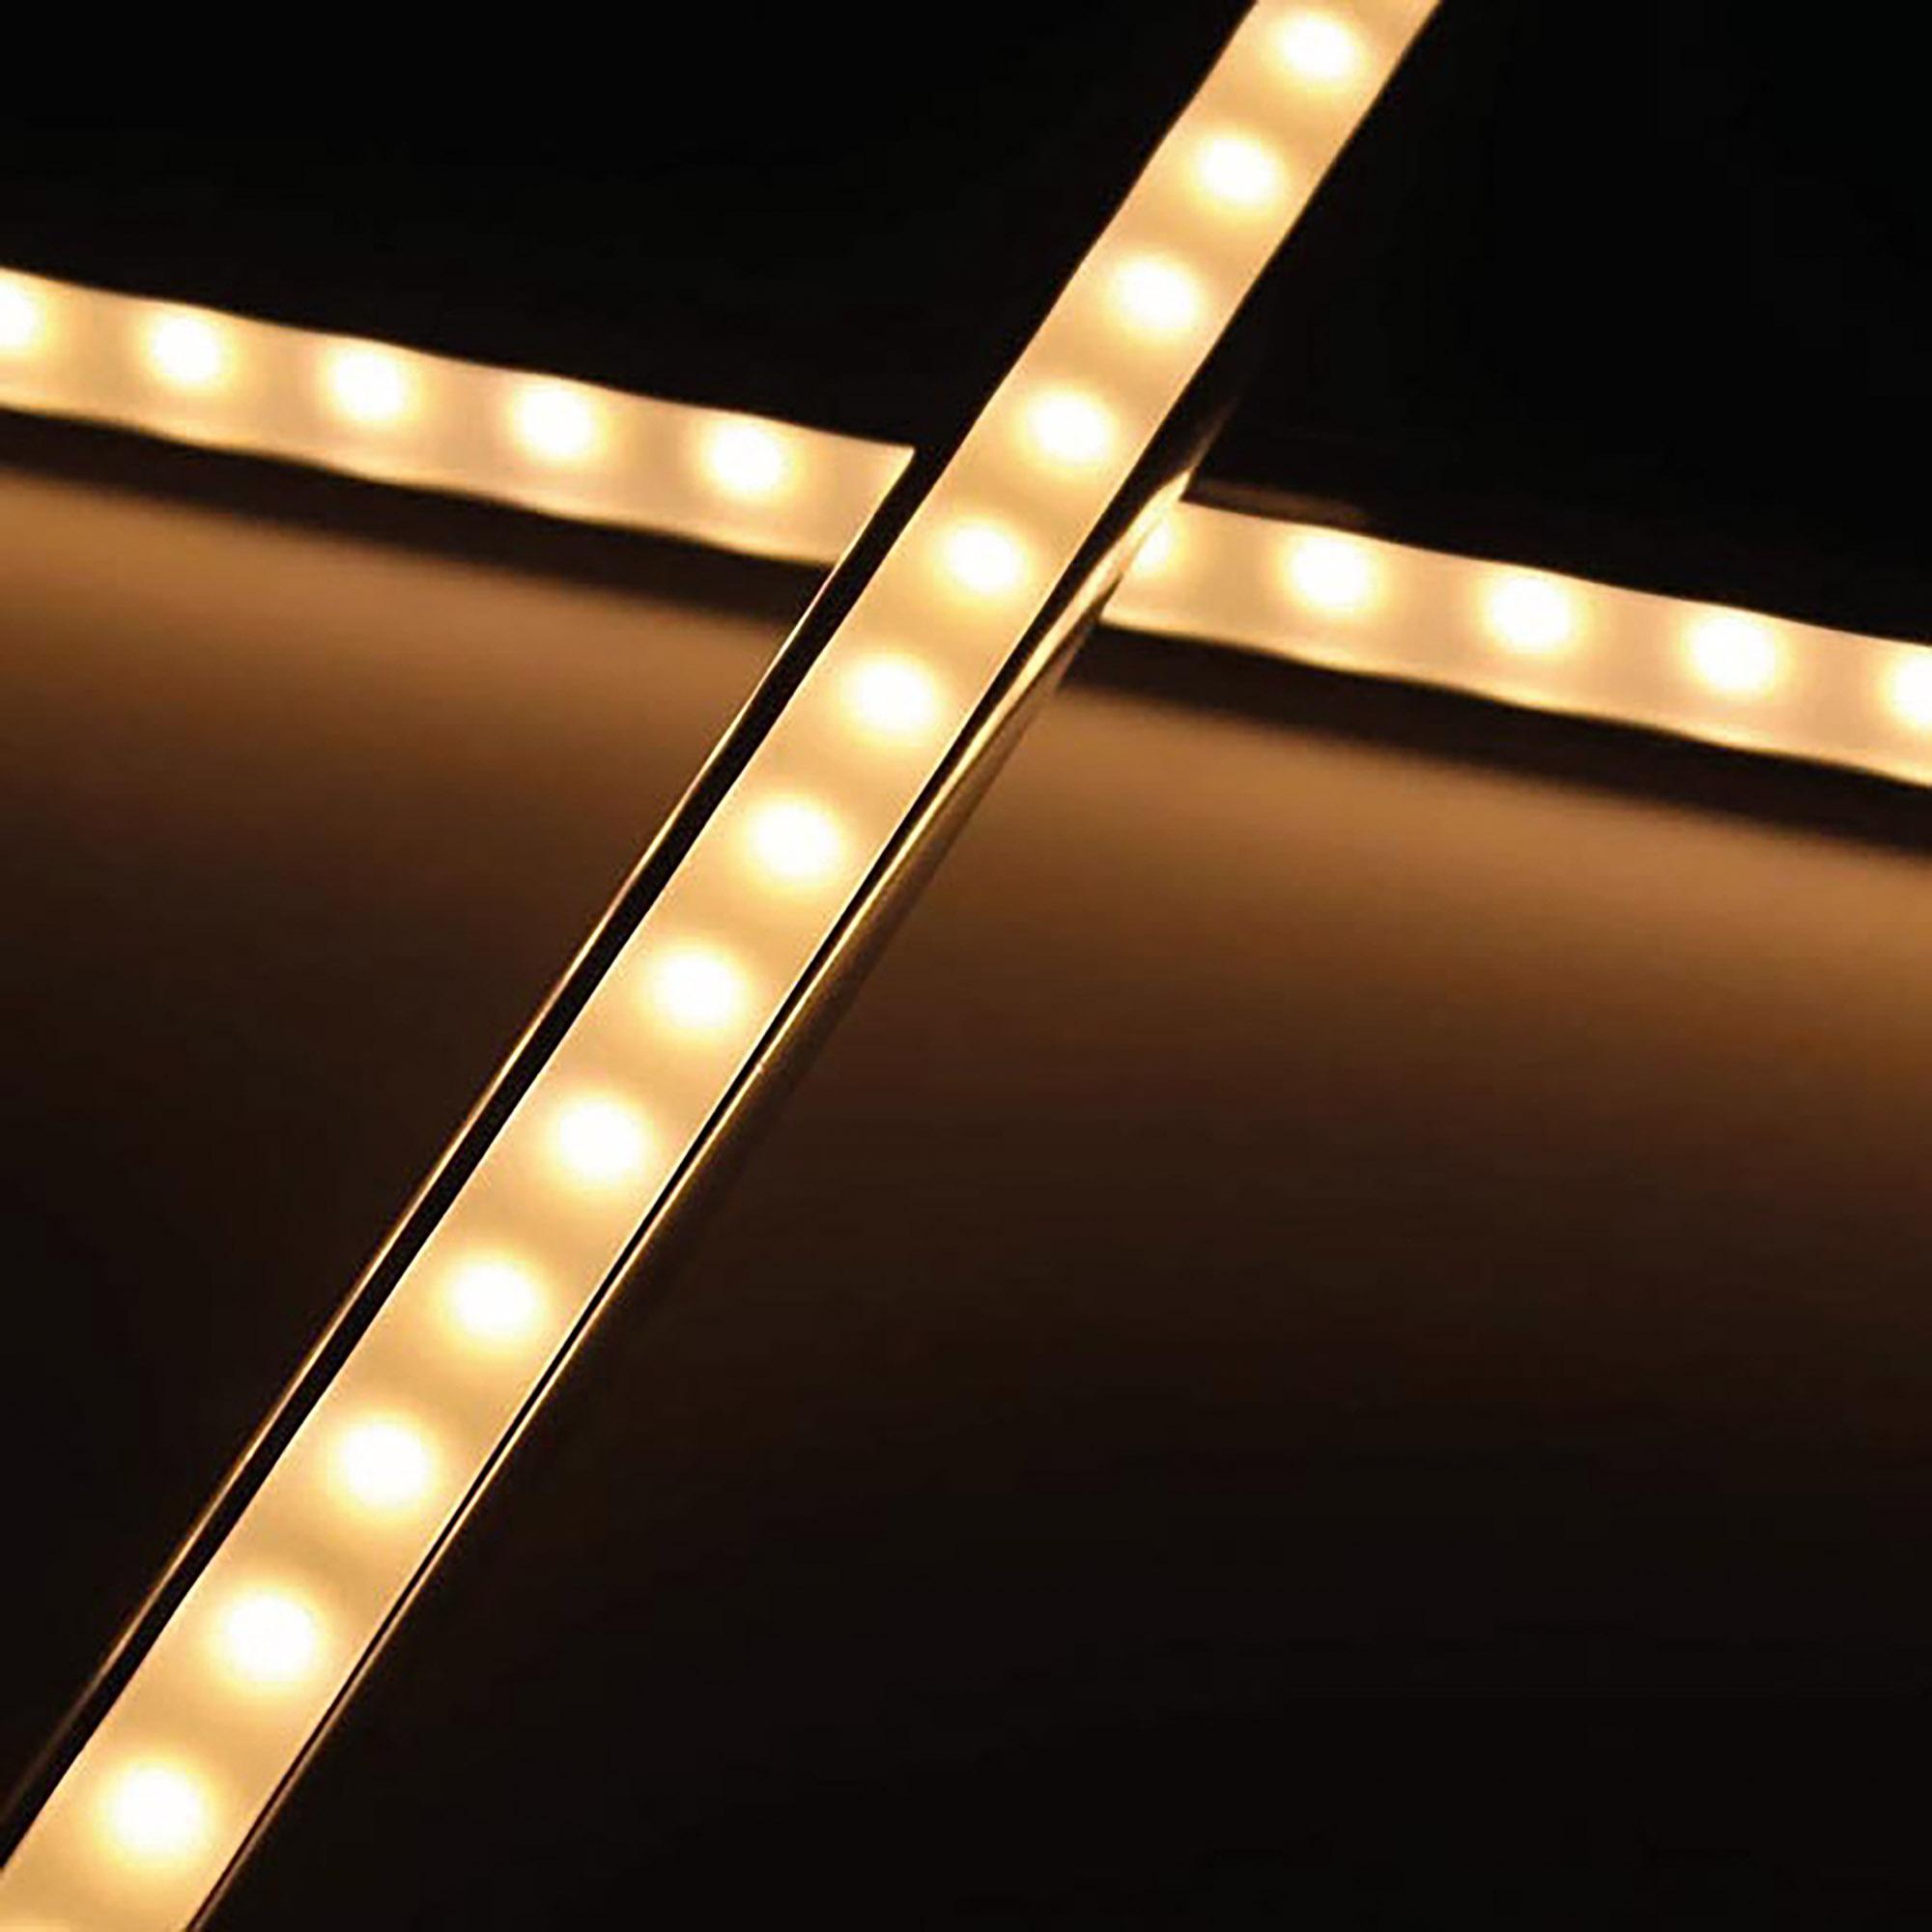 sp1_high-power-led-lichtleiste-diffus-warmweiss-24v-3000+x+3000-LR-Louis.jpg